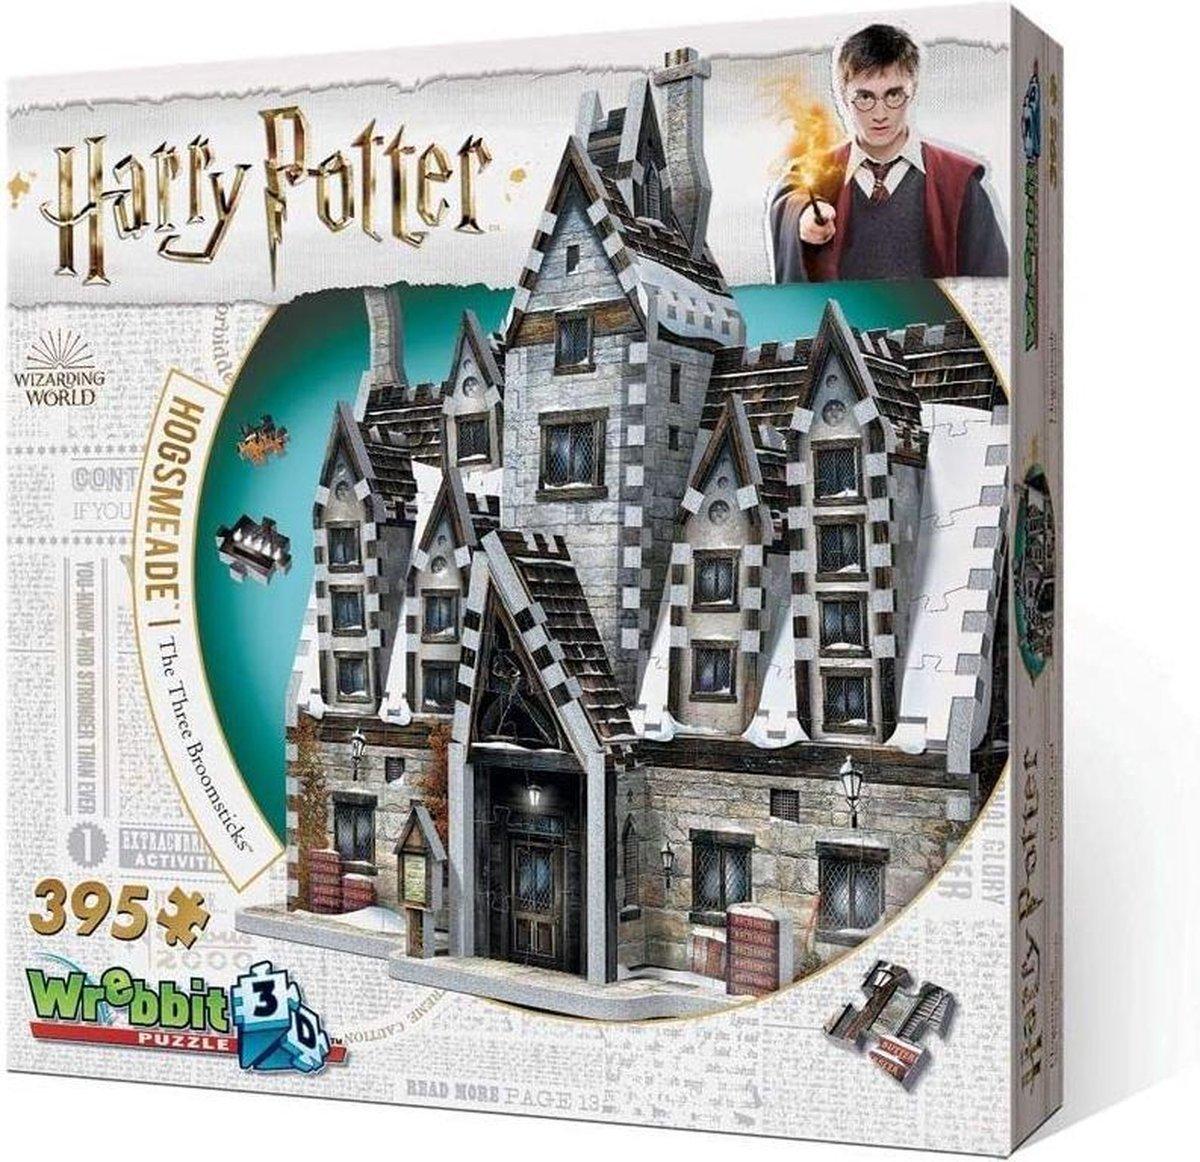 Wrebbit 3d Puzzel Harry Potter - The Three Broomsticks (Hogsmeade)